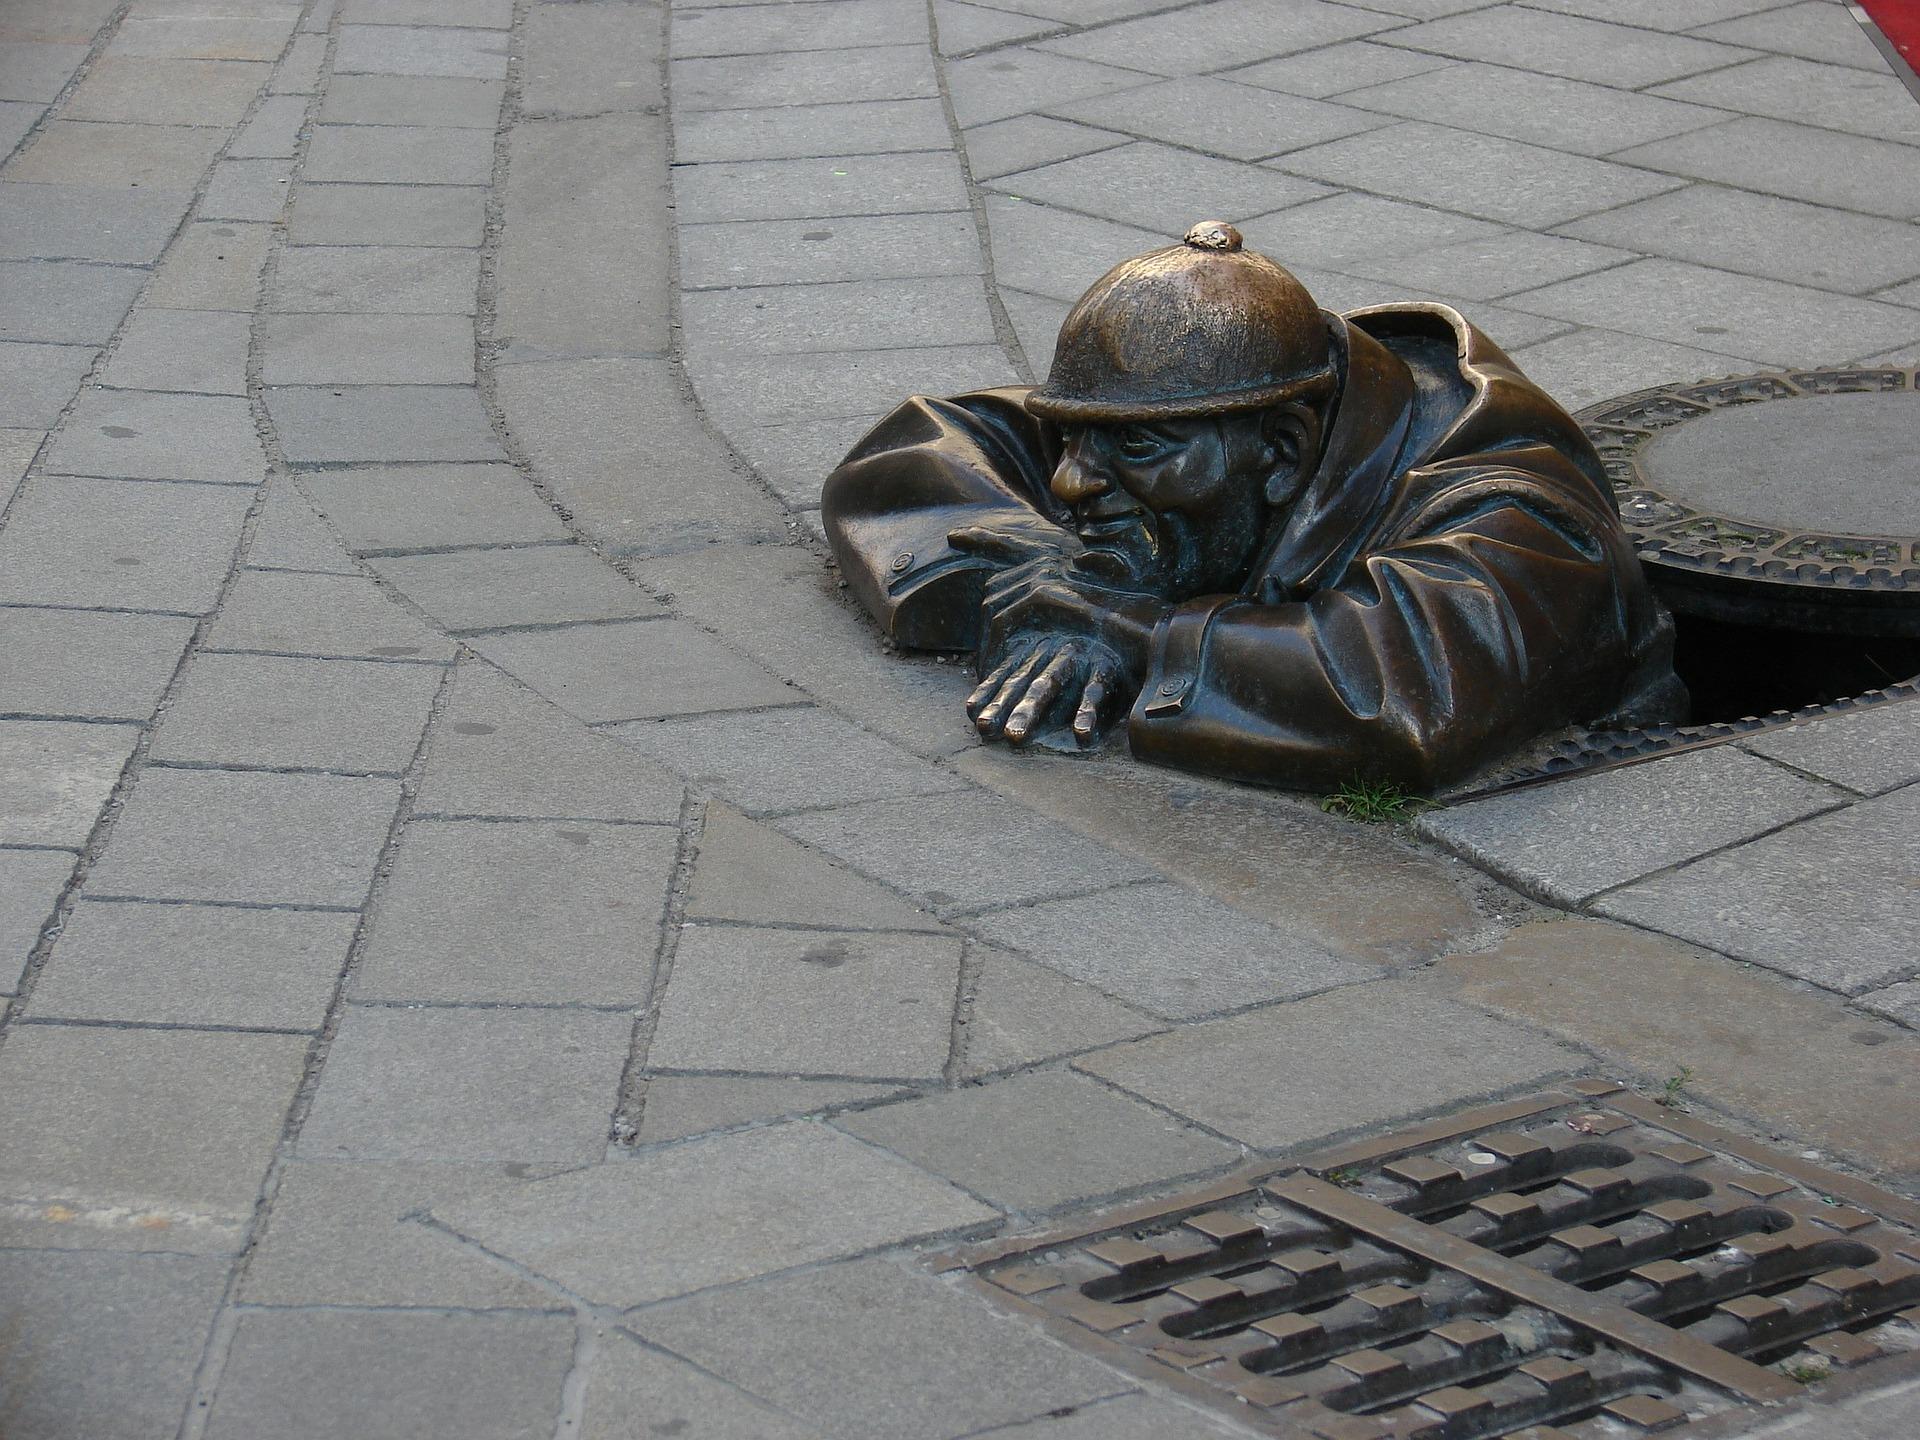 sculpture-83892_1920